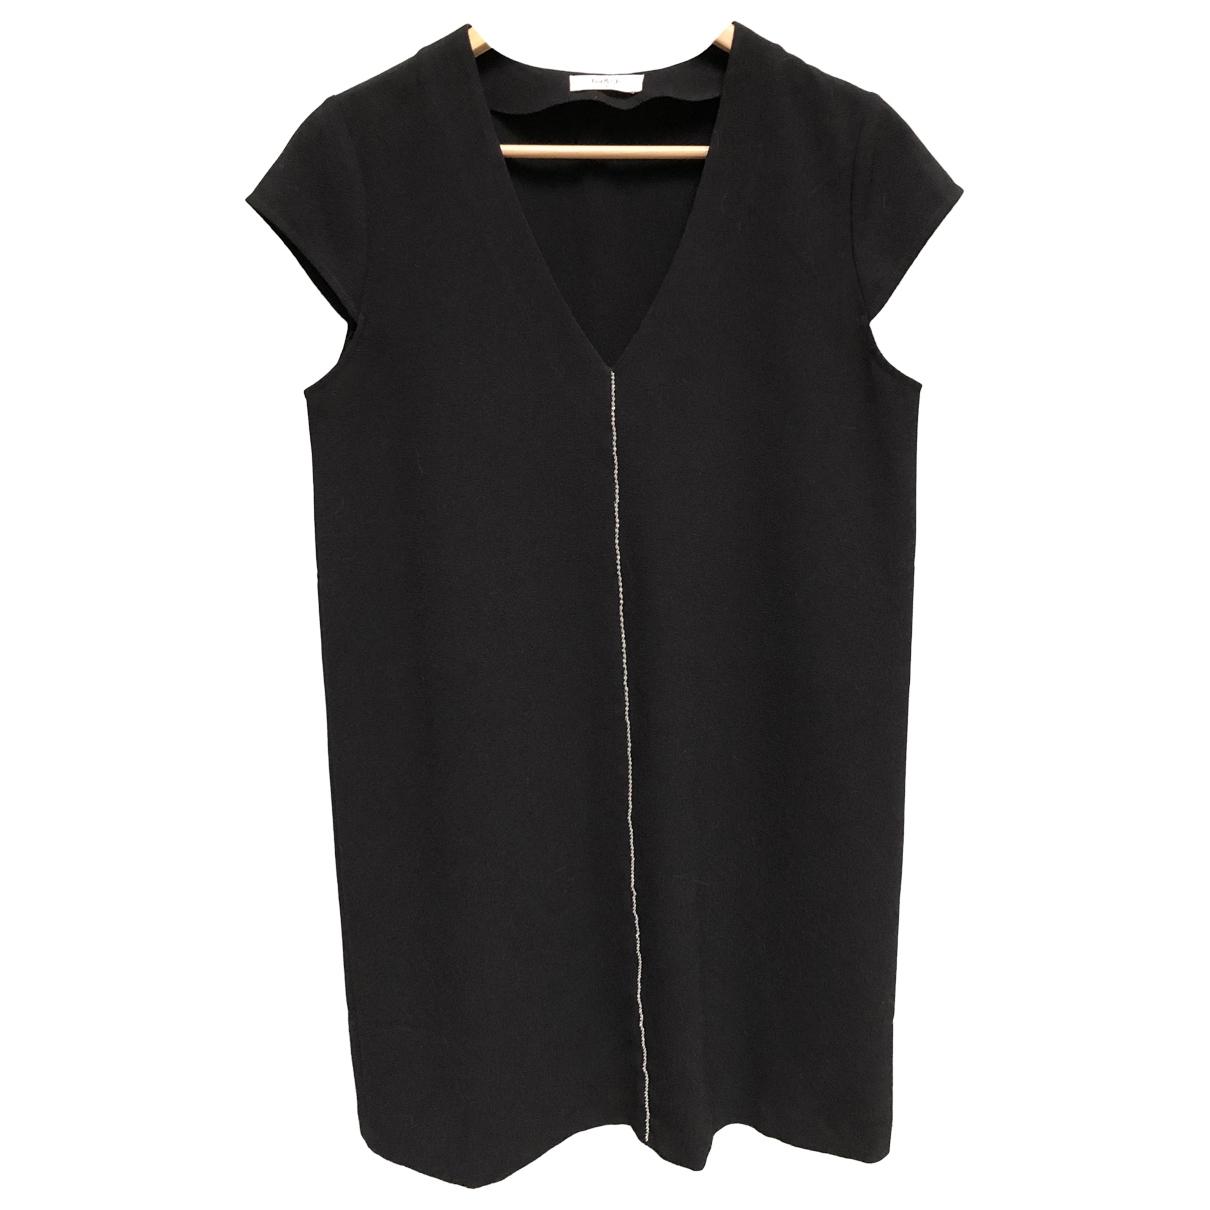 Ba&sh \N Black dress for Women 1 0-5